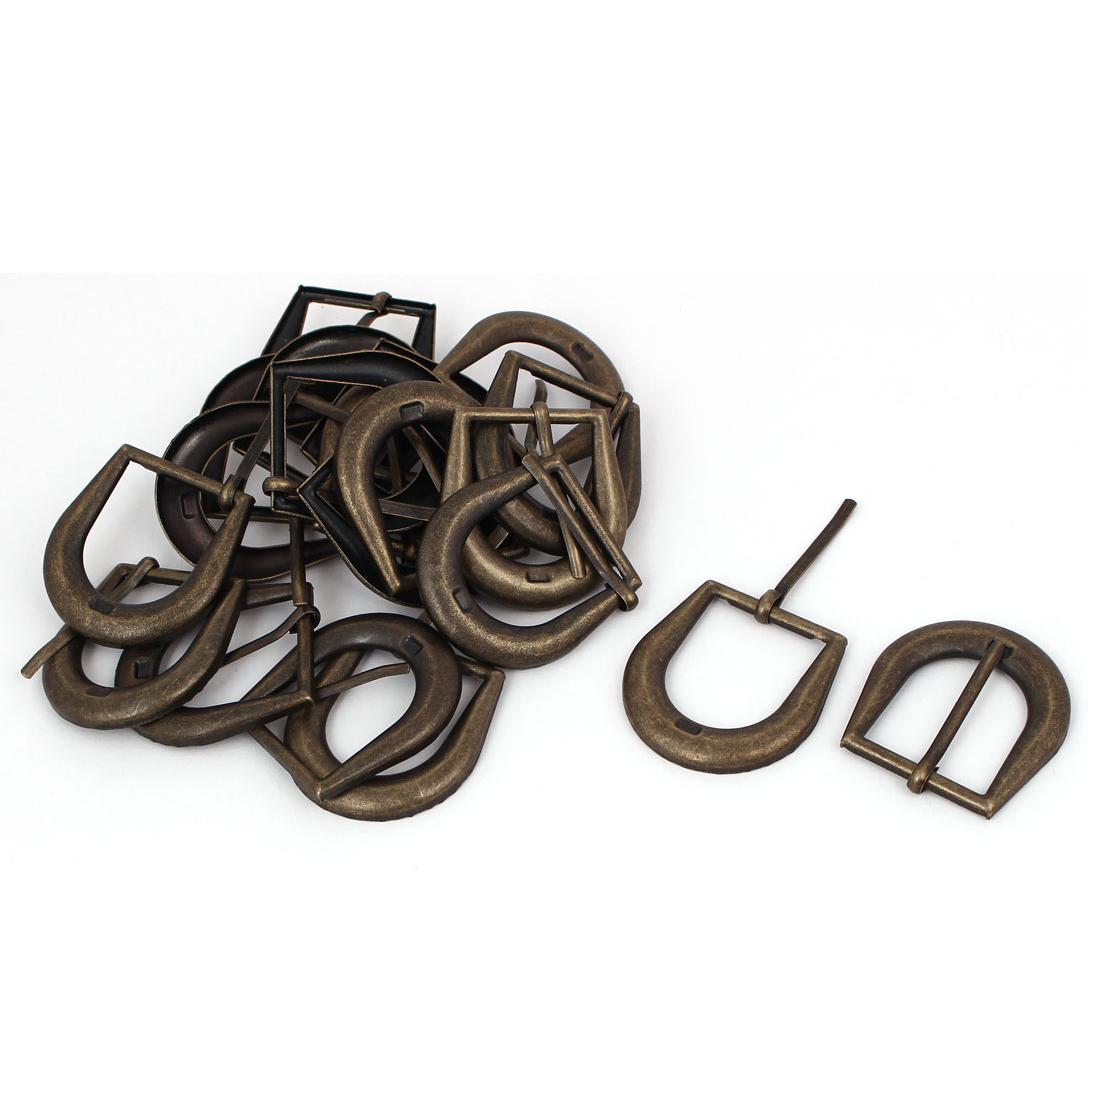 Leather Belt Iron Vintage Style Single Pin Buckle Bronze Tone 20pcs